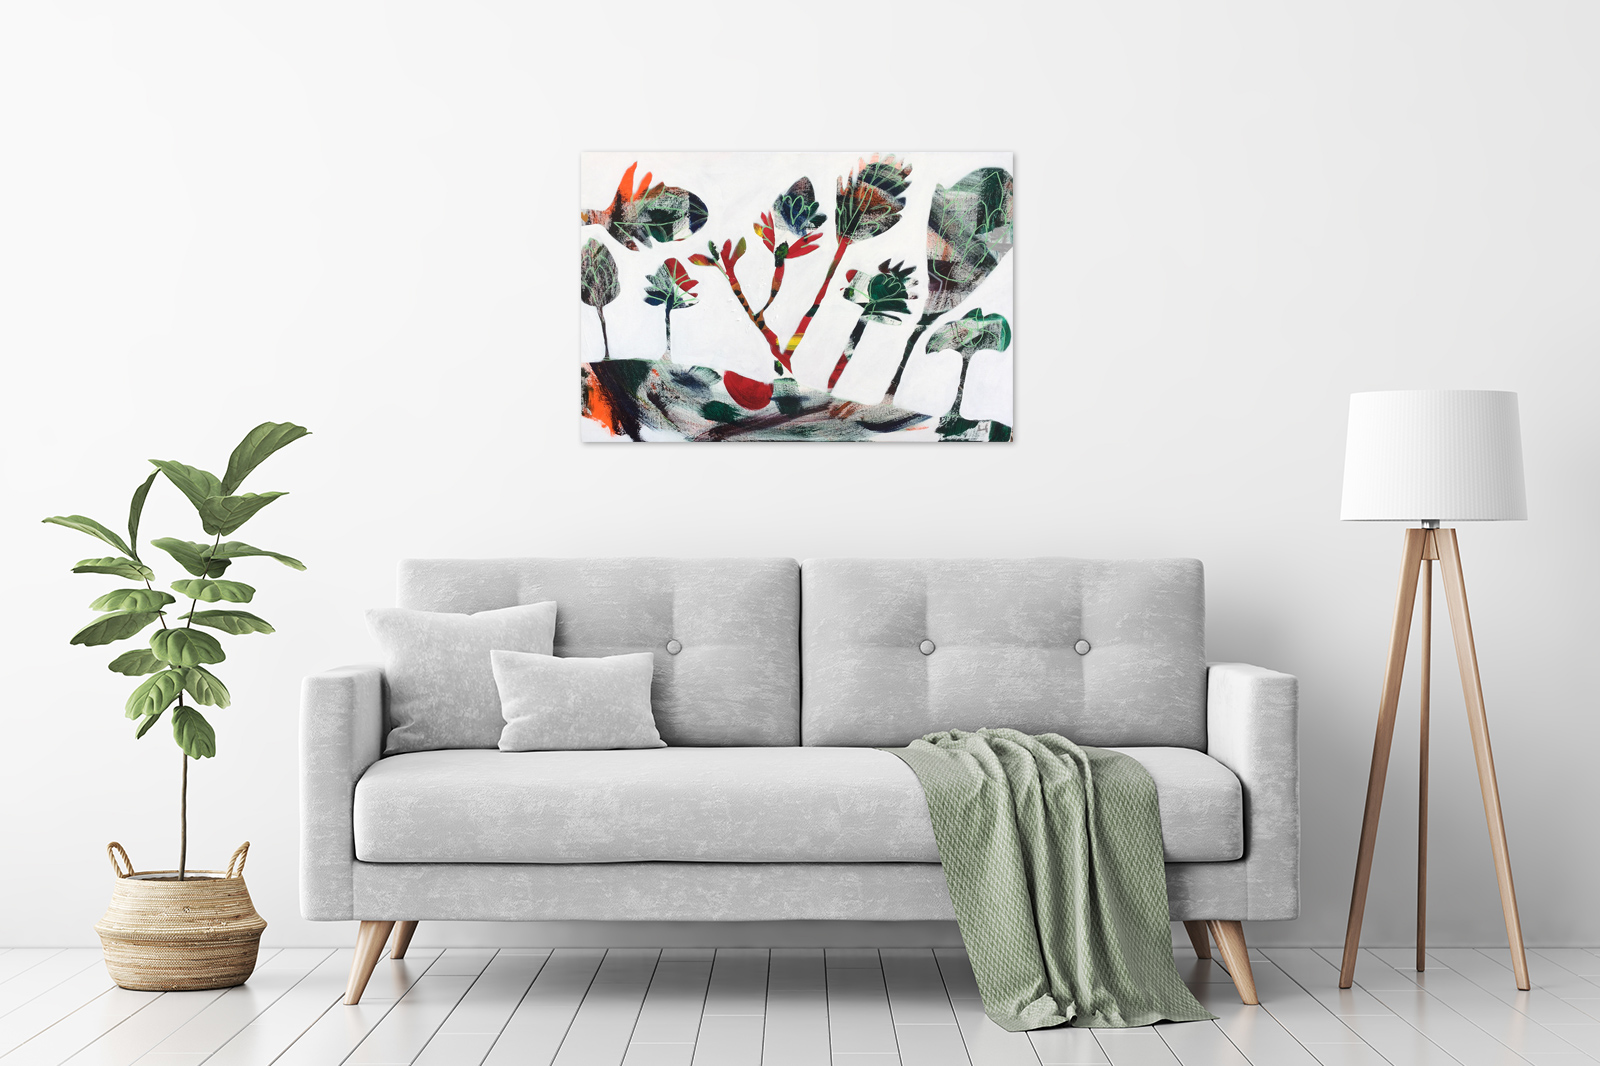 Karin Hotchkin - 'Proteas' in a room